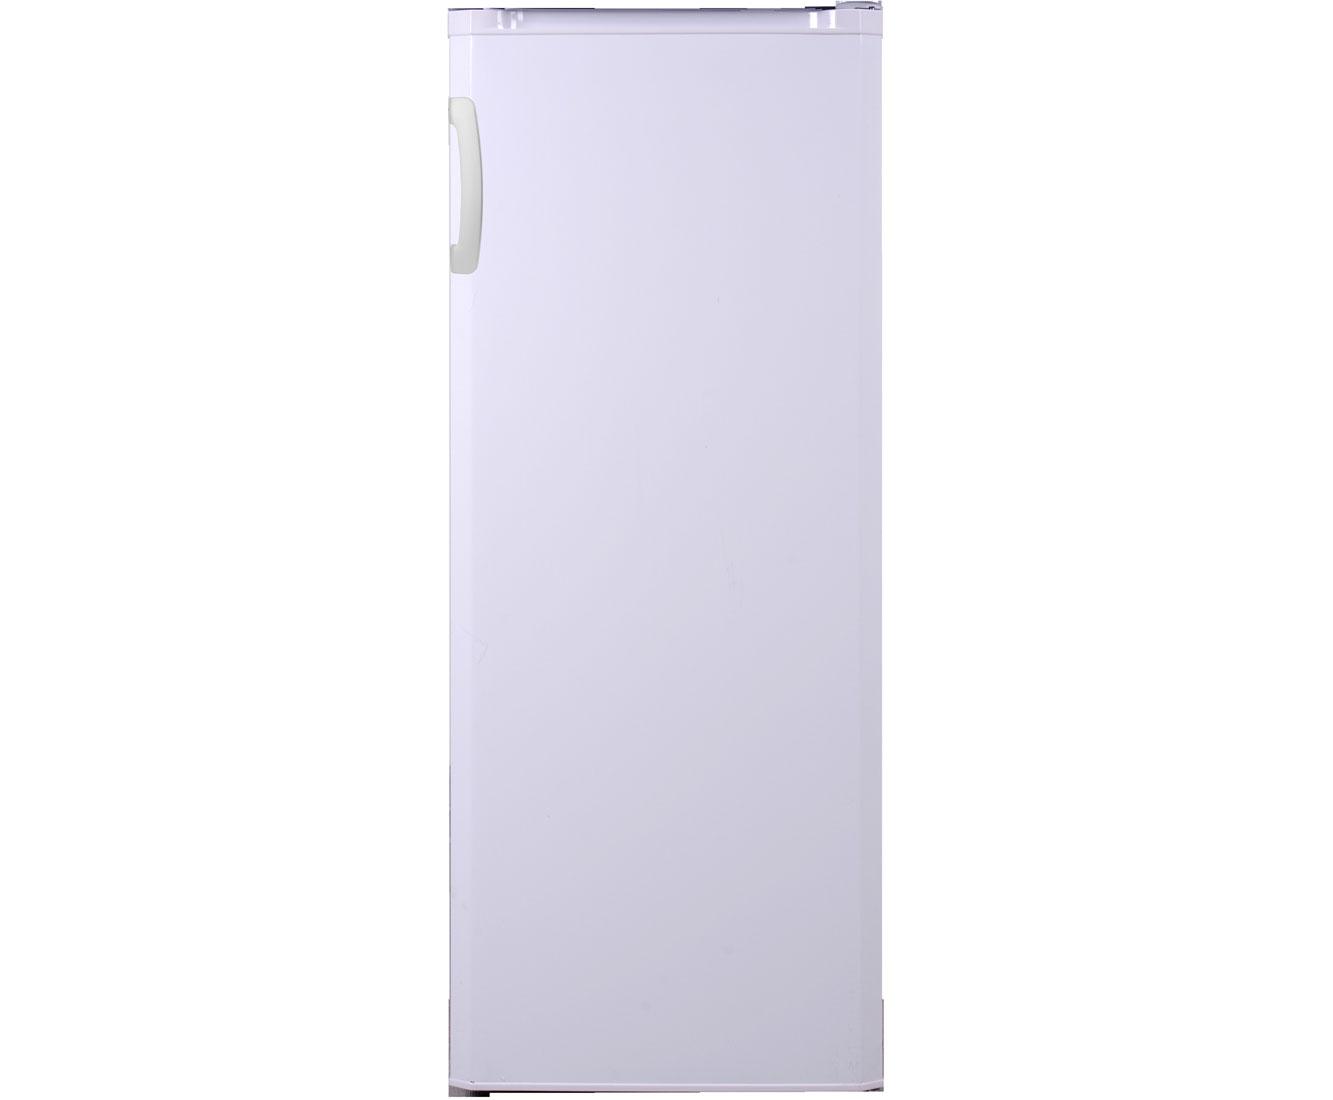 Amica Kühlschrank 55 Cm : Amica vks w kühlschrank freistehend cm weiß neu ebay